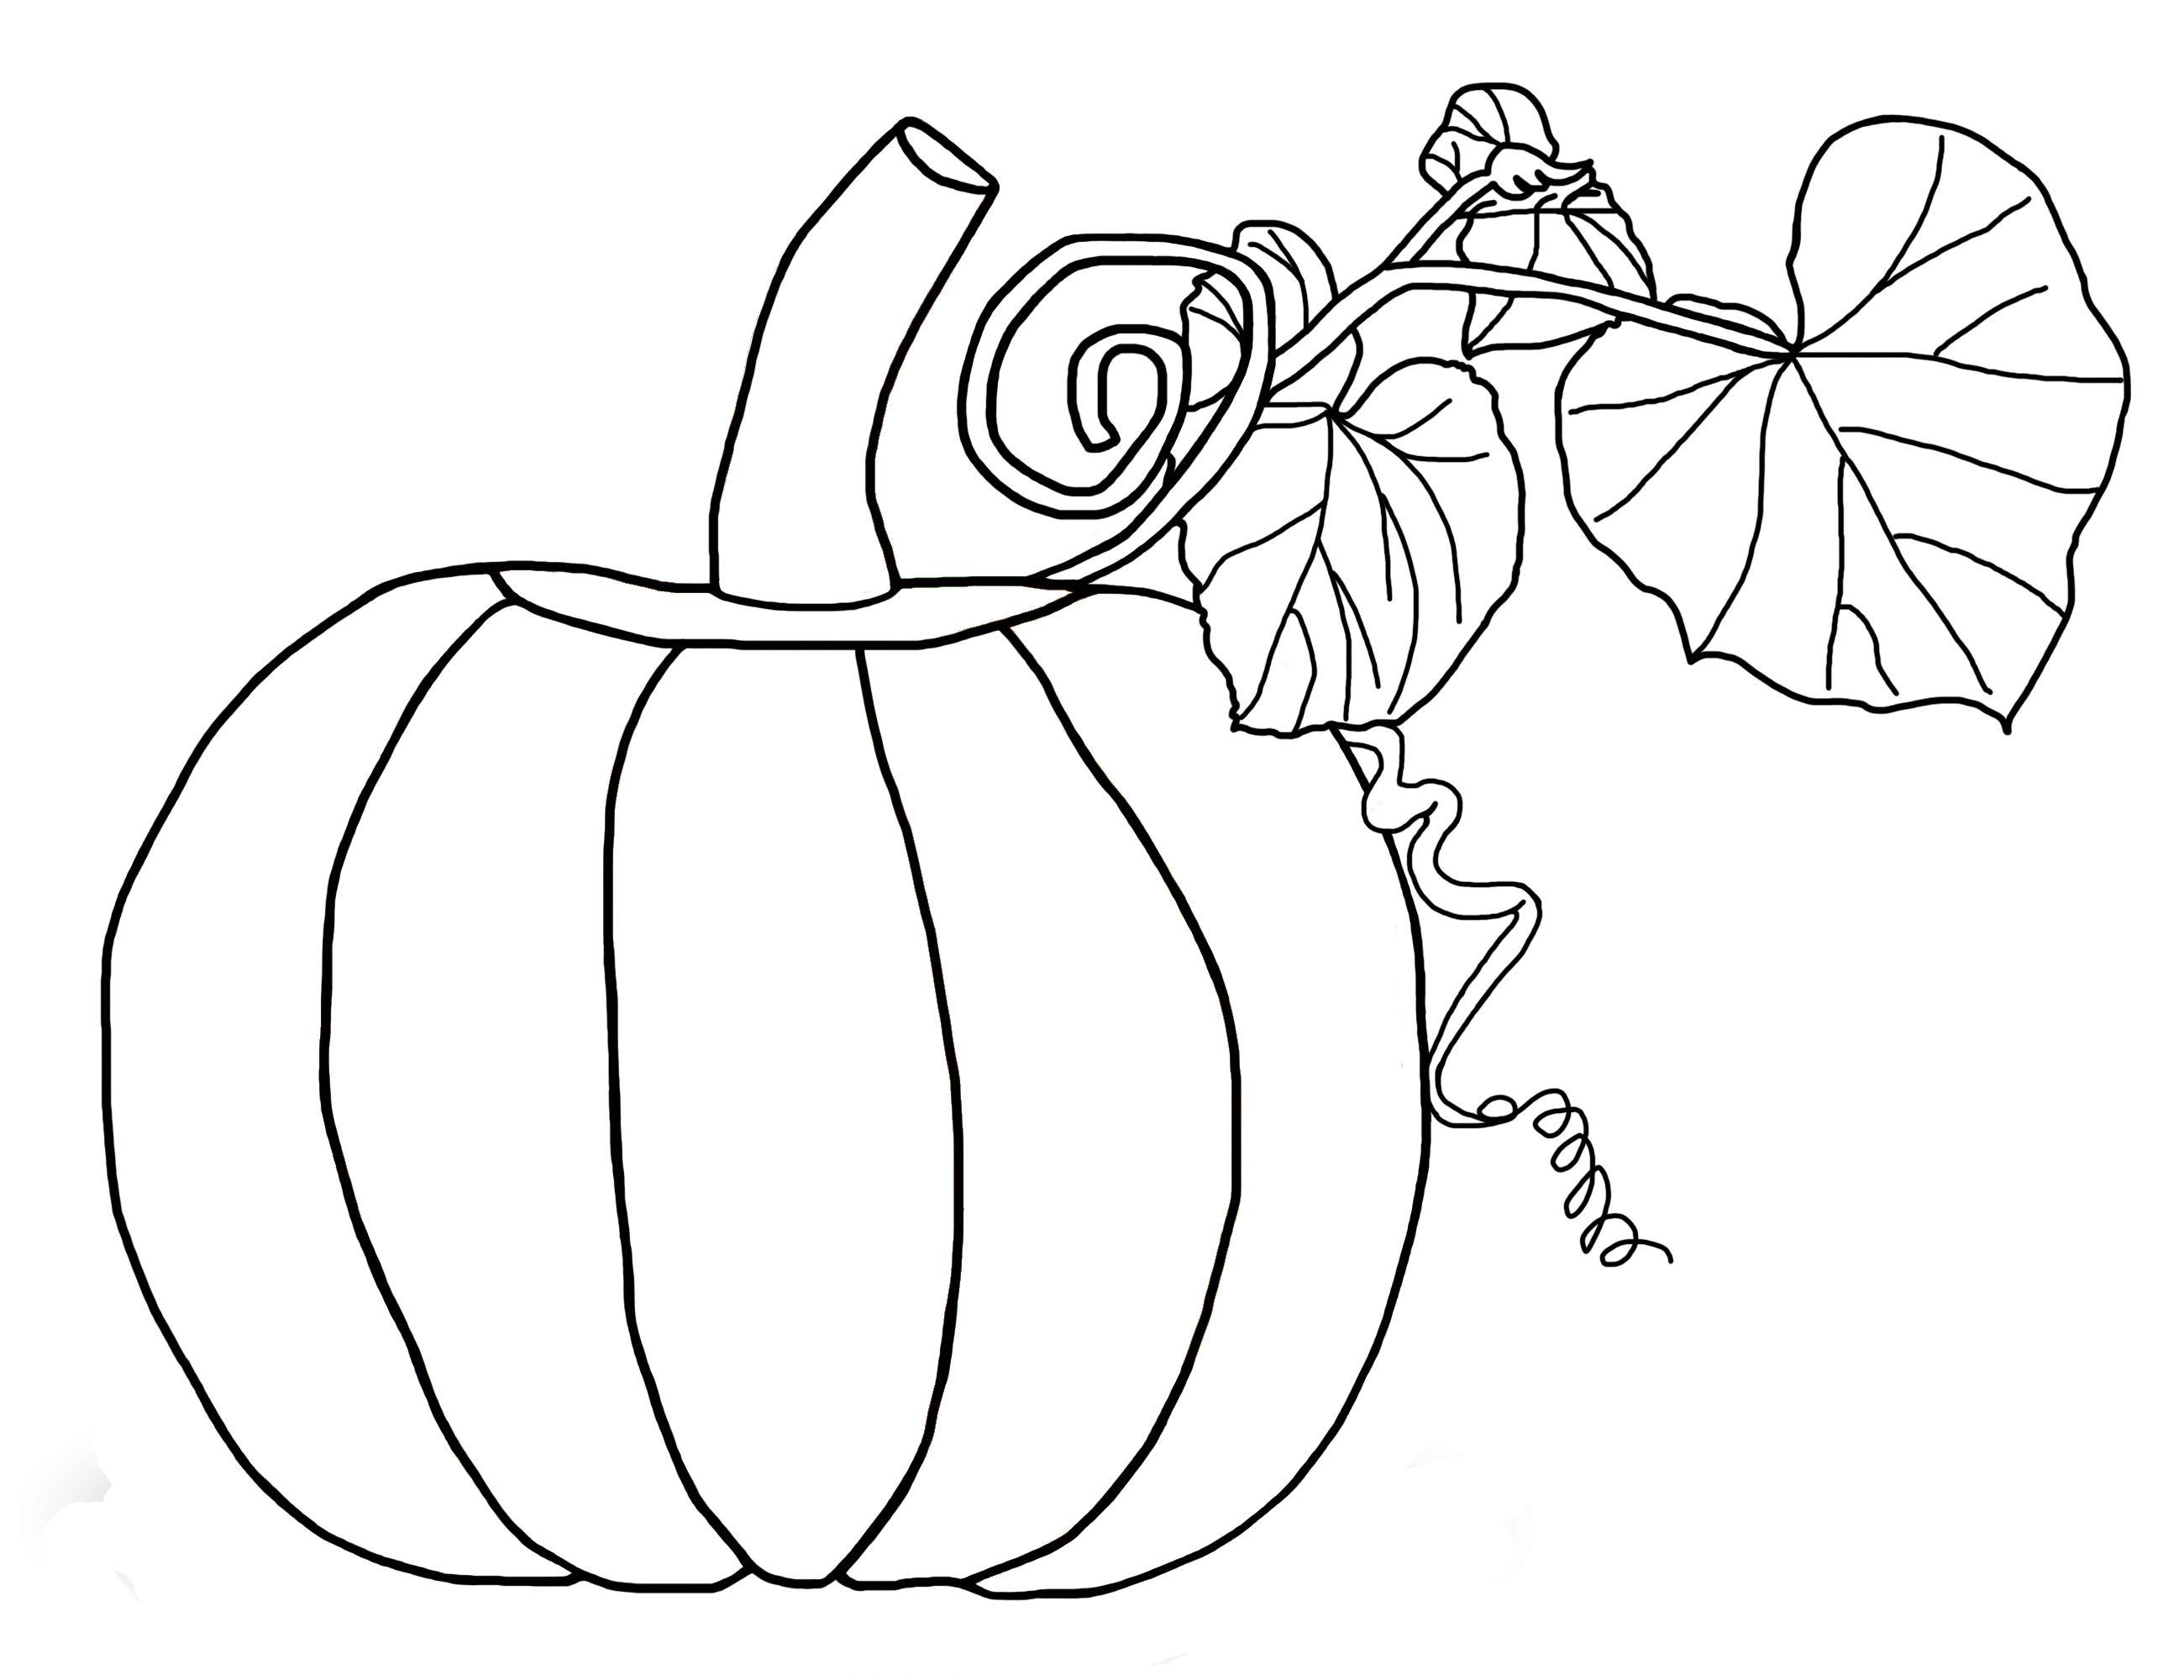 blank pumpkin template coloring home Blank Pumpkin Template  Blank Pumpkin Coloring Sheet